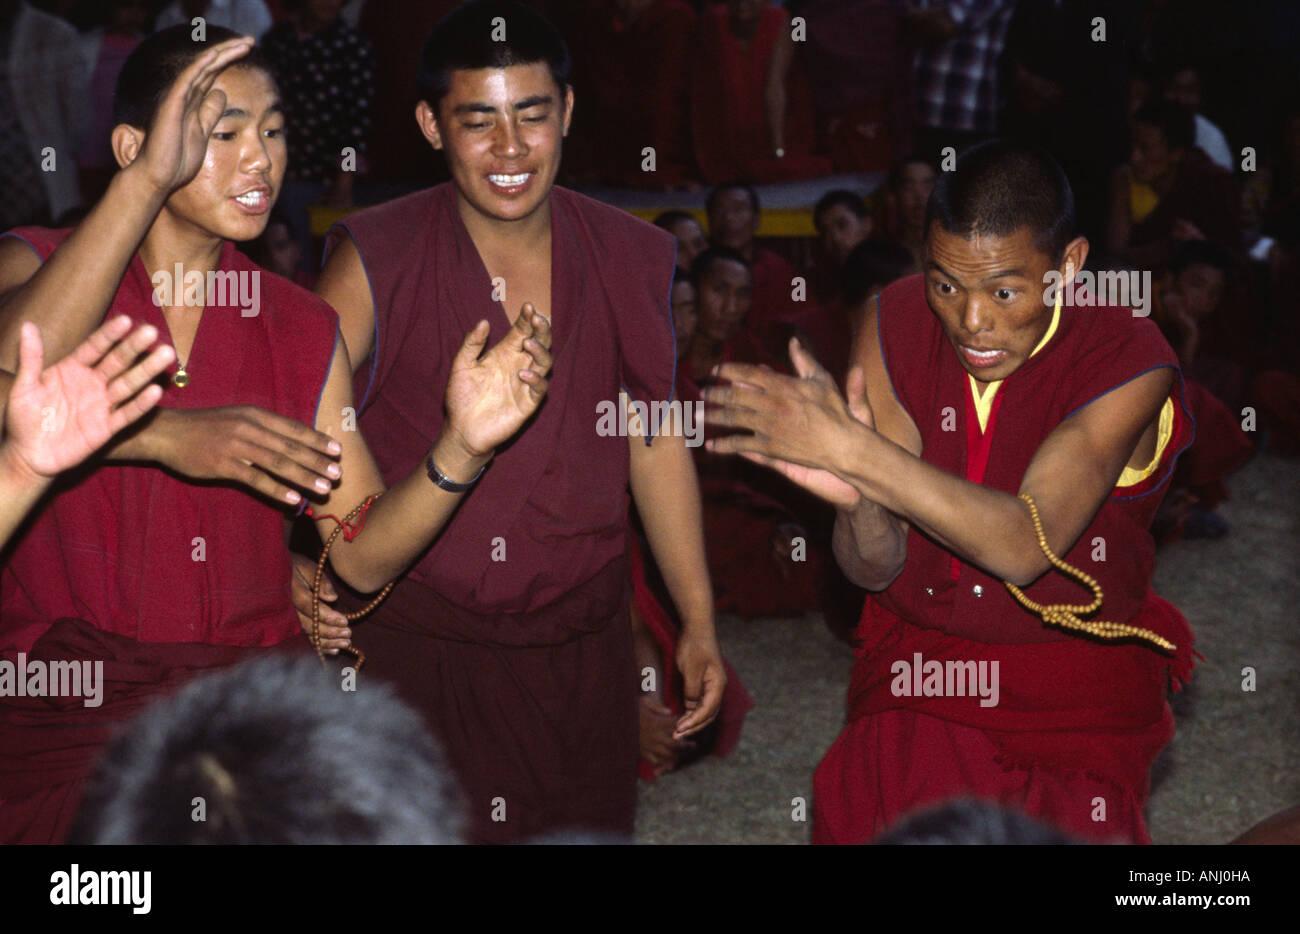 Debating monks. Dharamsala, Himachal Pradesh. India - Stock Image